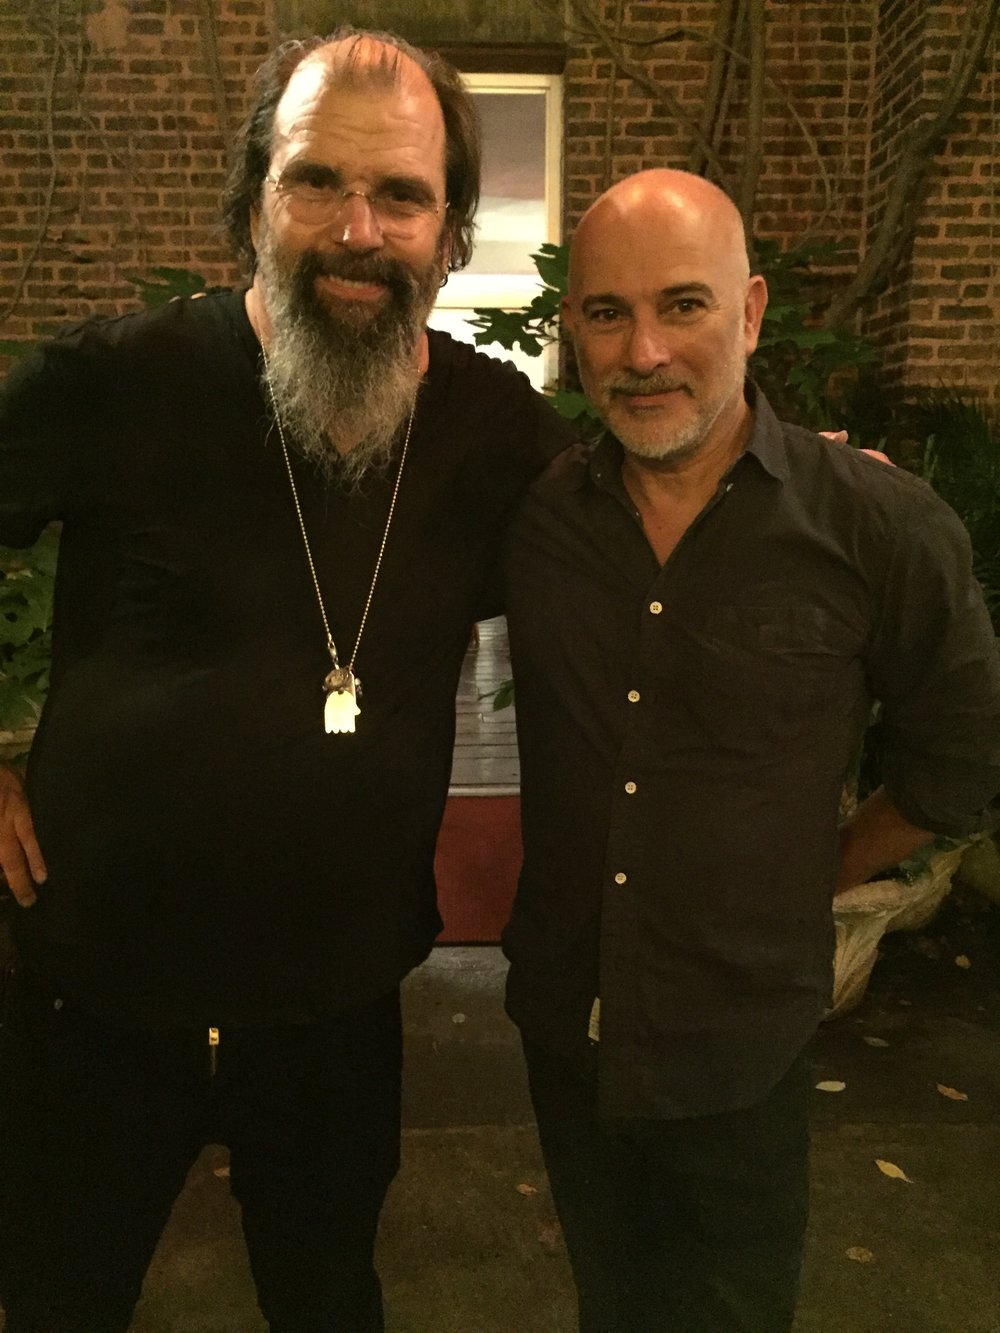 Steve Earle and Izhar Patkin. Photo by  @lyndachurilla